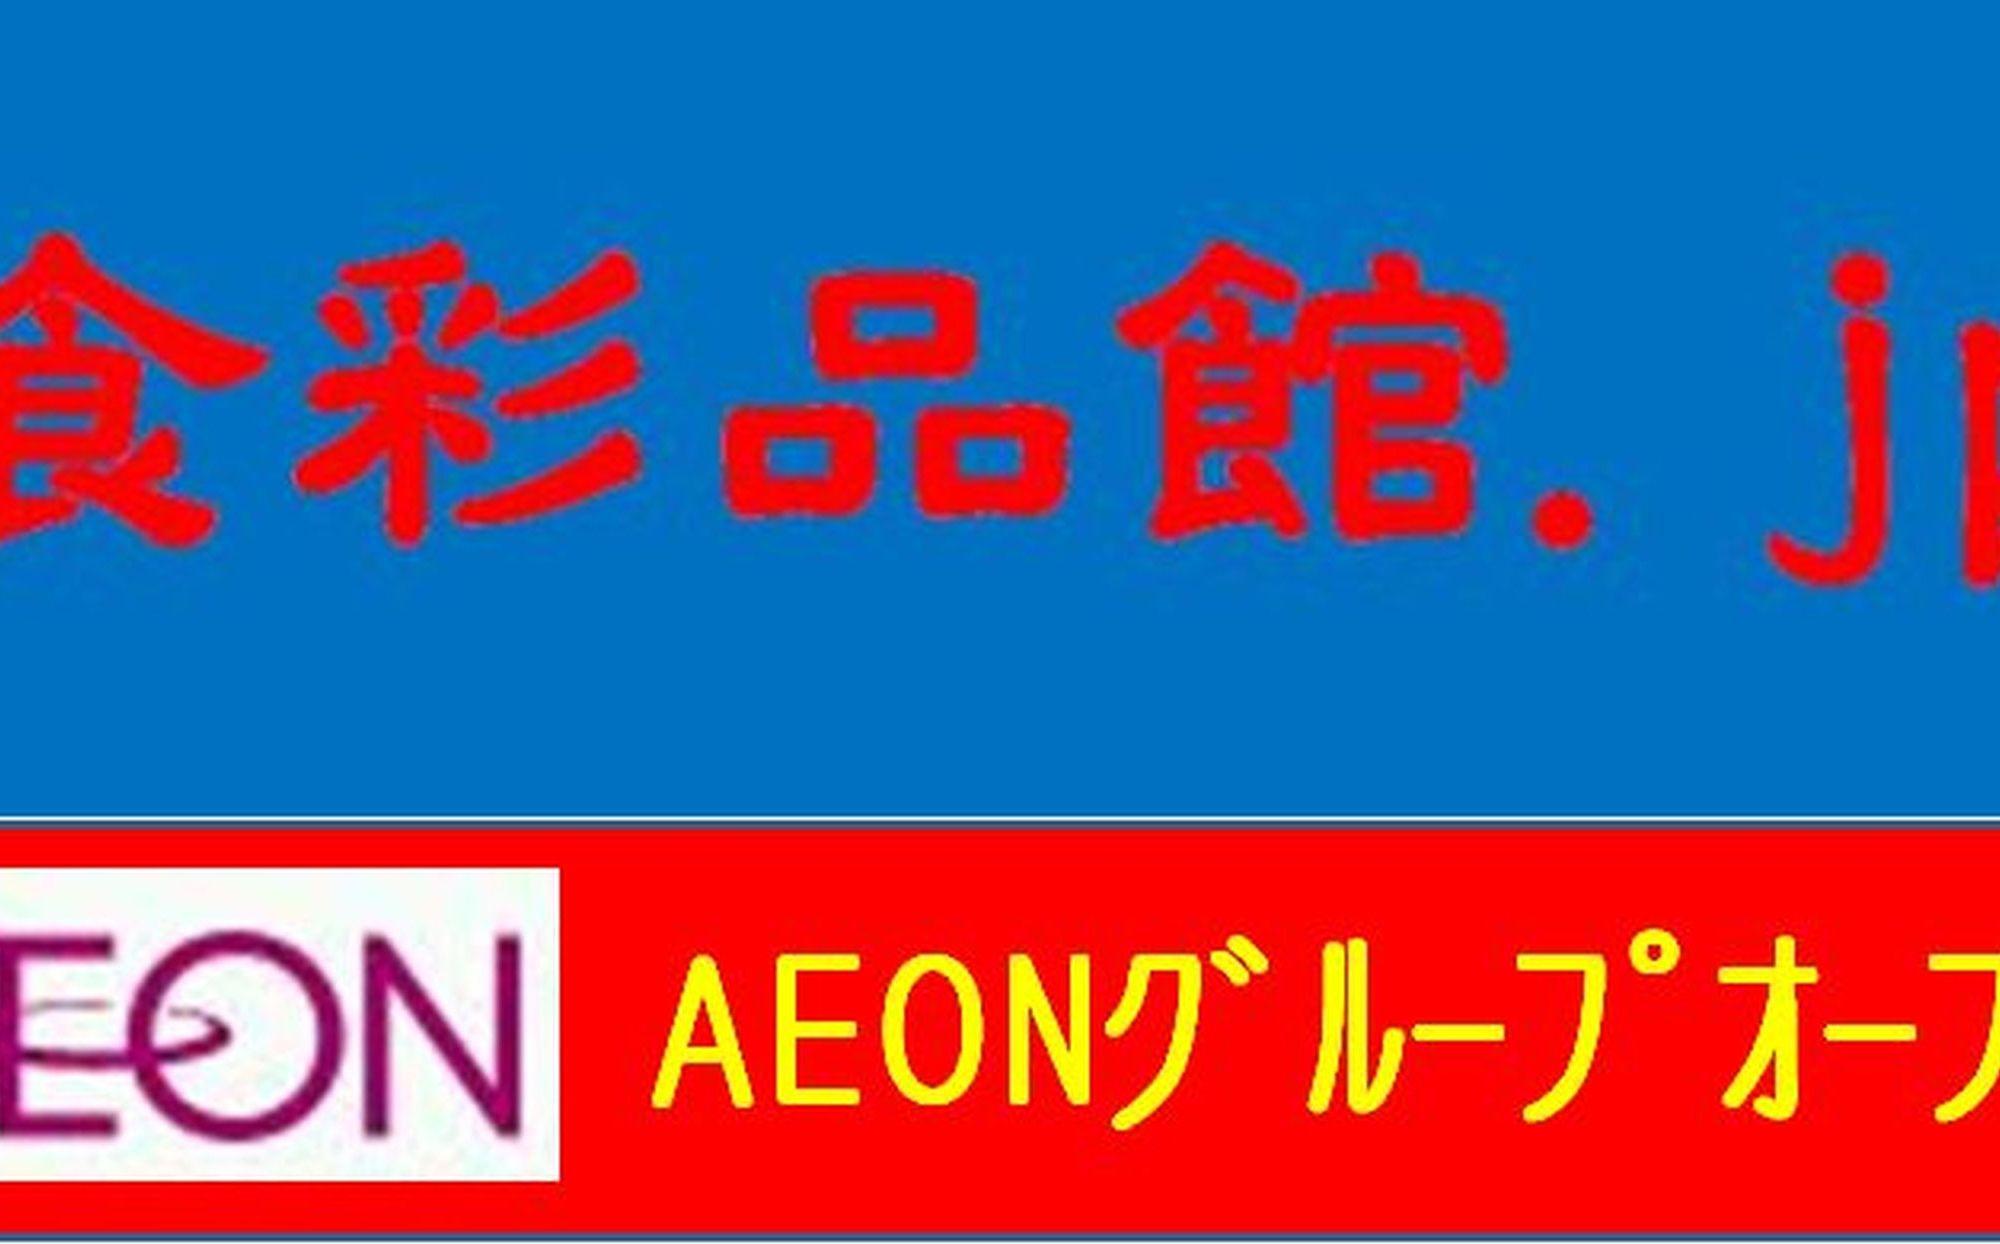 SUPERMARKET KOHYO神戸店(光洋,コーヨー,兵庫県神戸駅,ビエラ神戸)2020年秋オープン予定。神戸駅高架下の耐震補強工事完了により再開店。